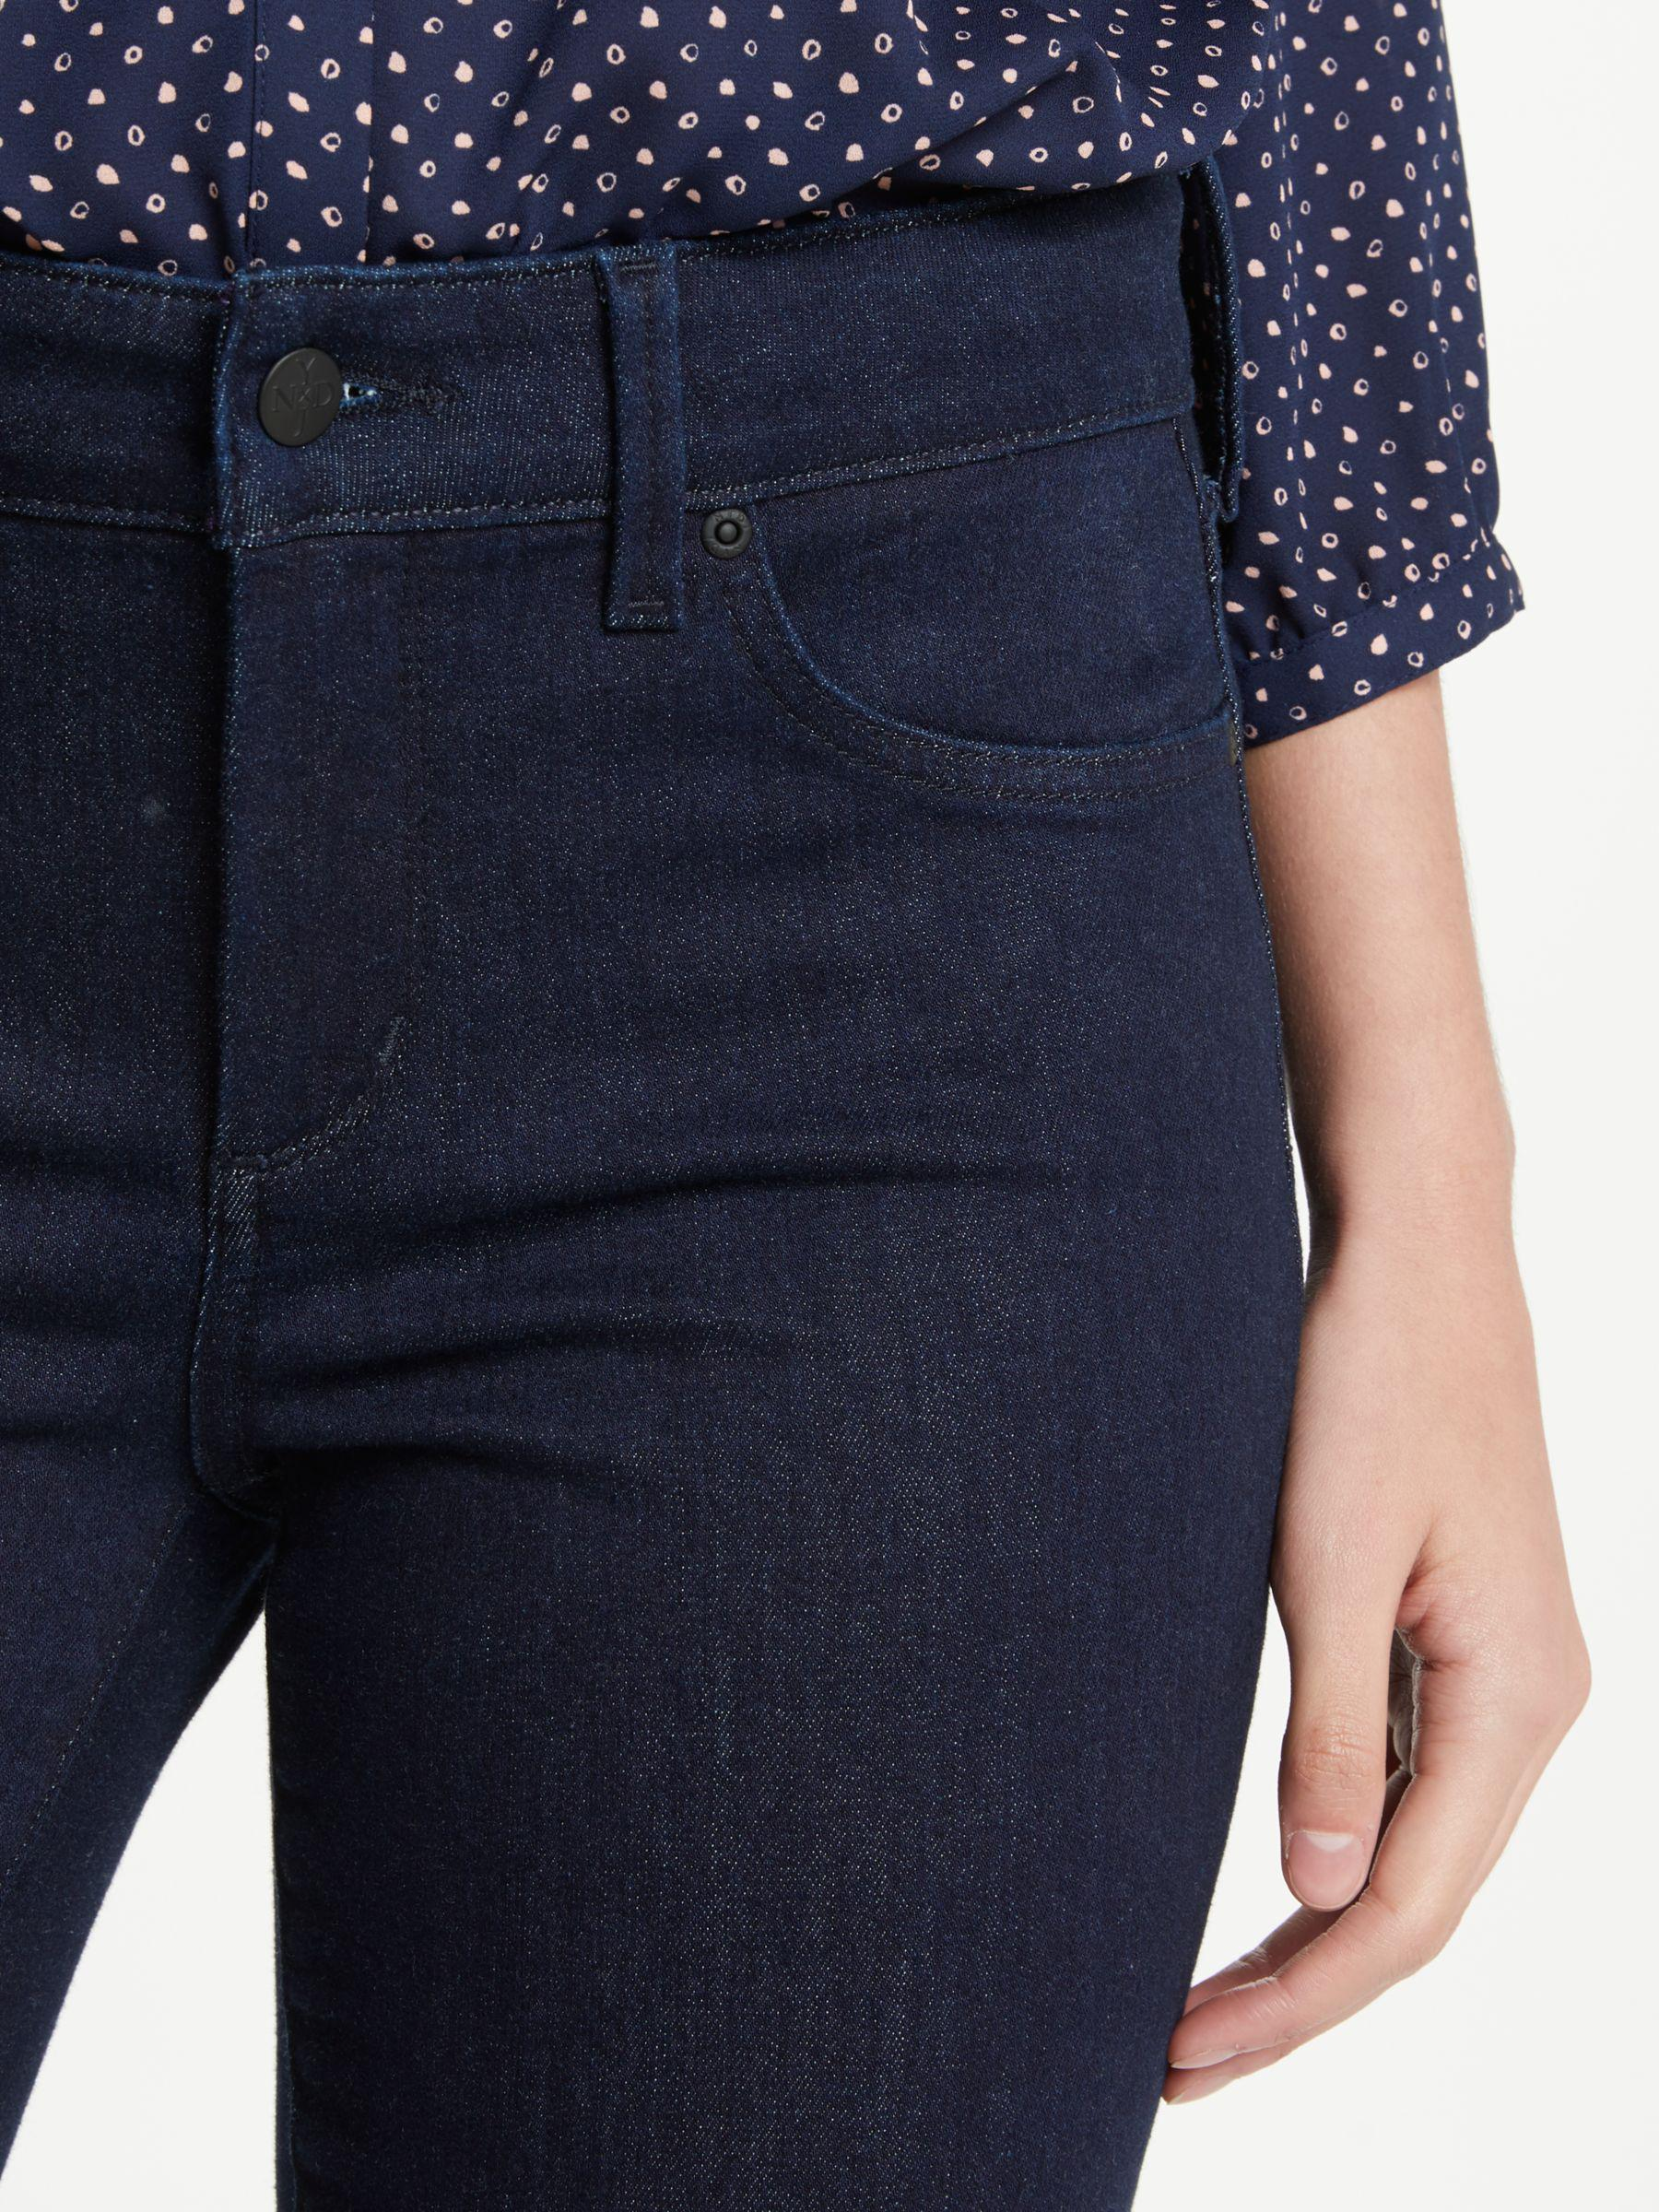 John Lewis Denim Nydj Sheri Slim Jeans in Rinse (Blue)